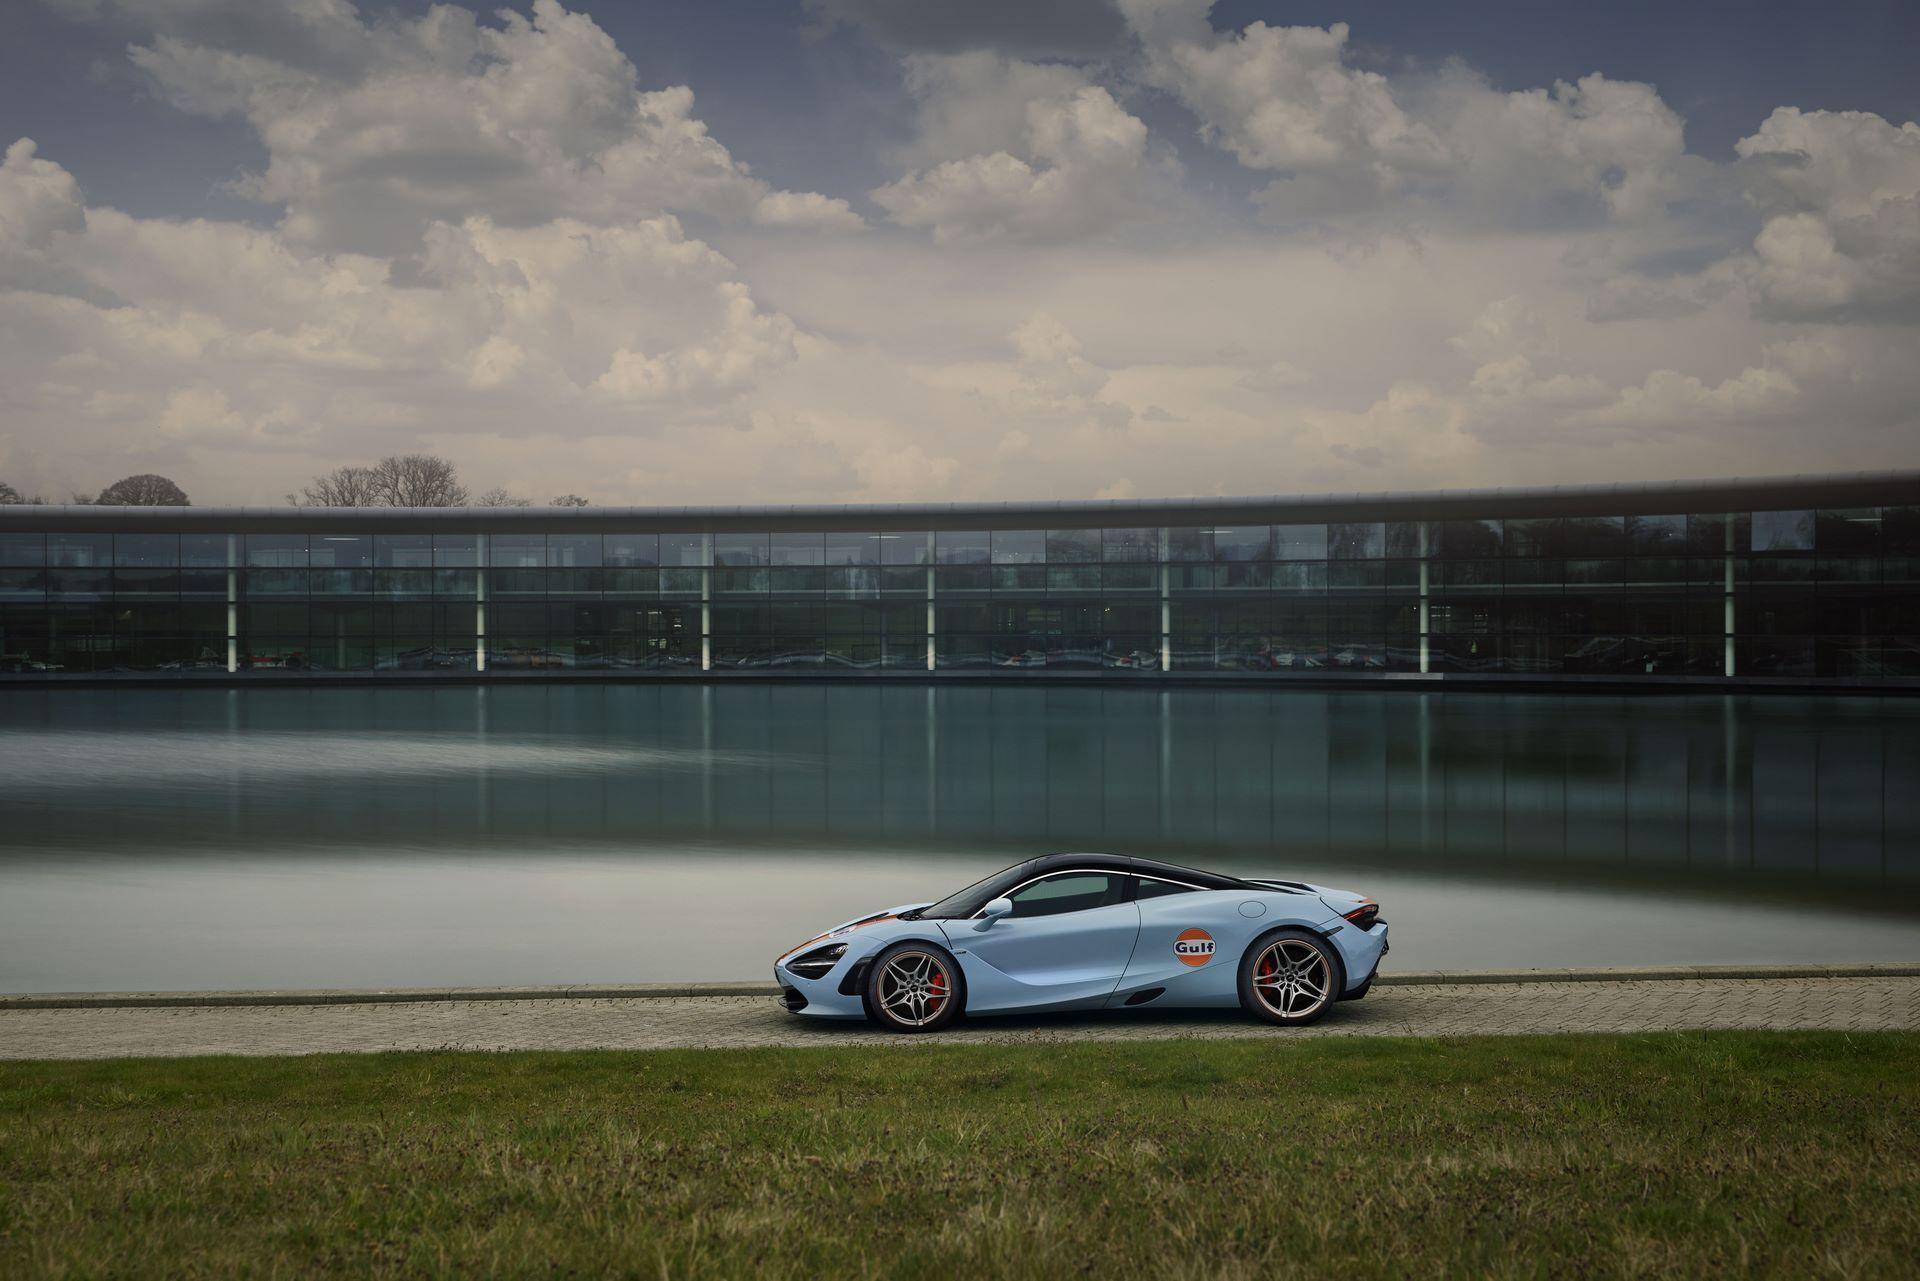 McLaren-720S-with-Gulf-livery-3